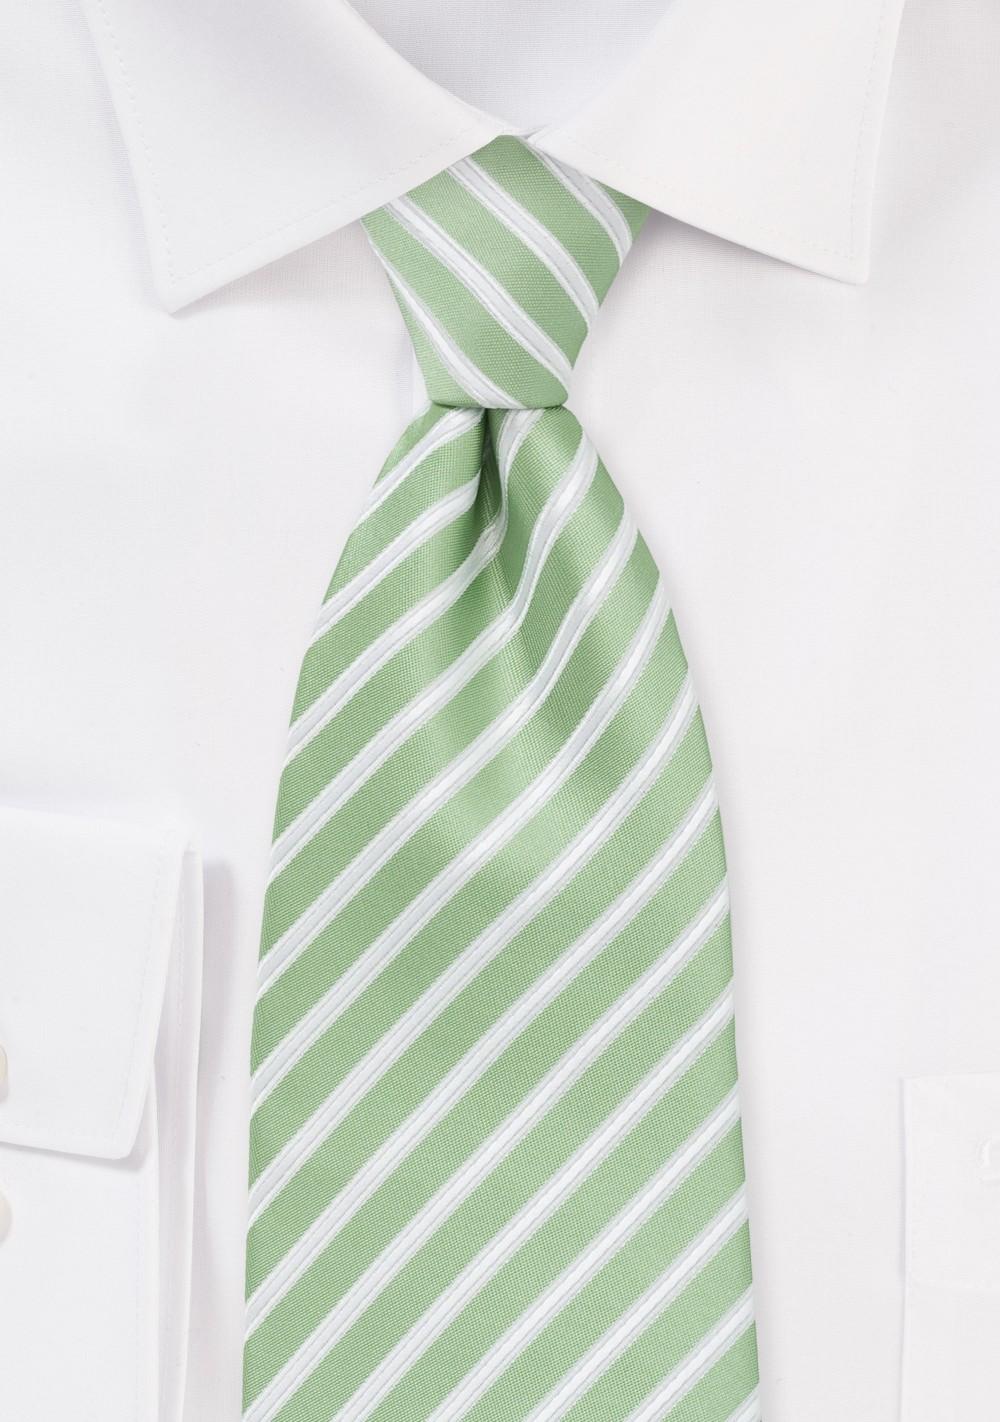 Seafoam Green Striped Tie